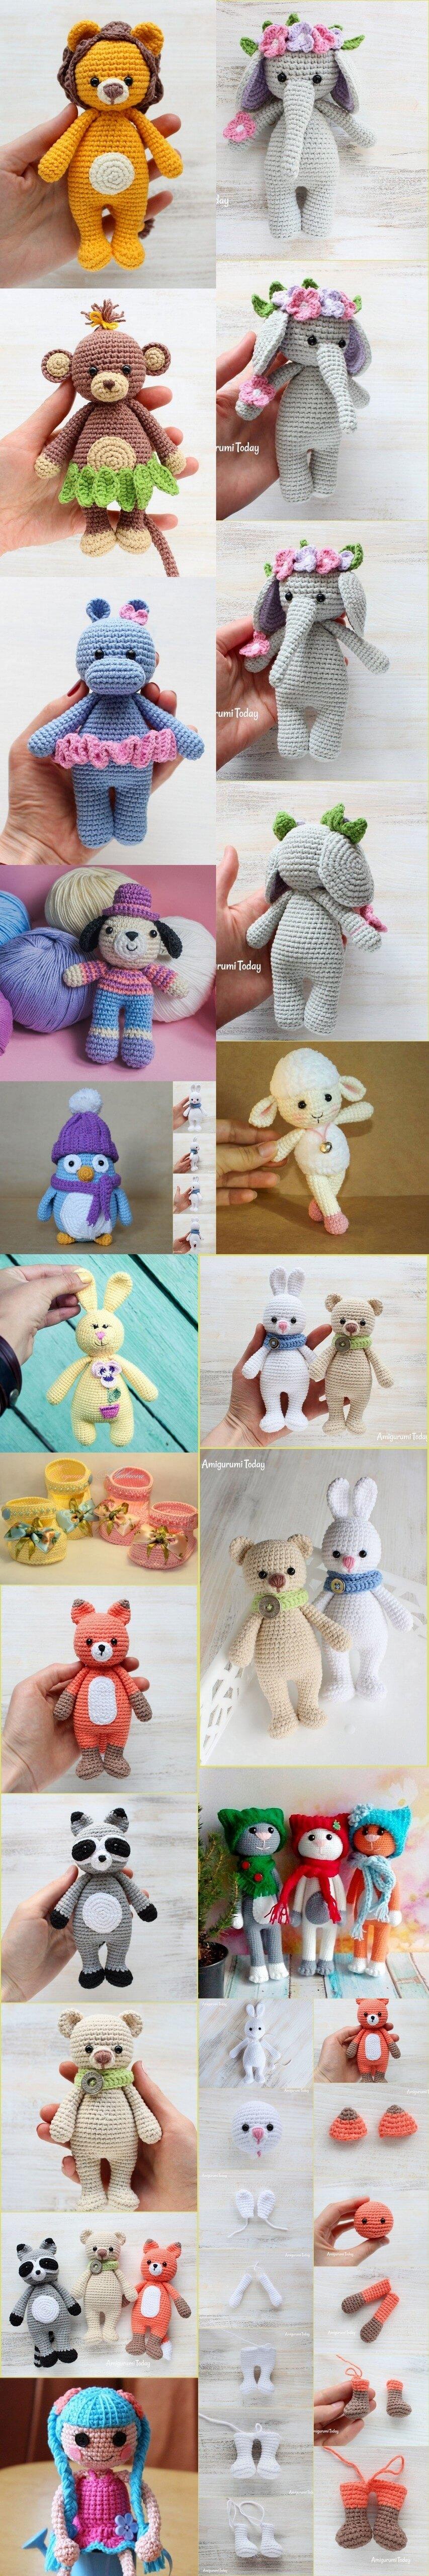 Crochet Toys Ideas (2)